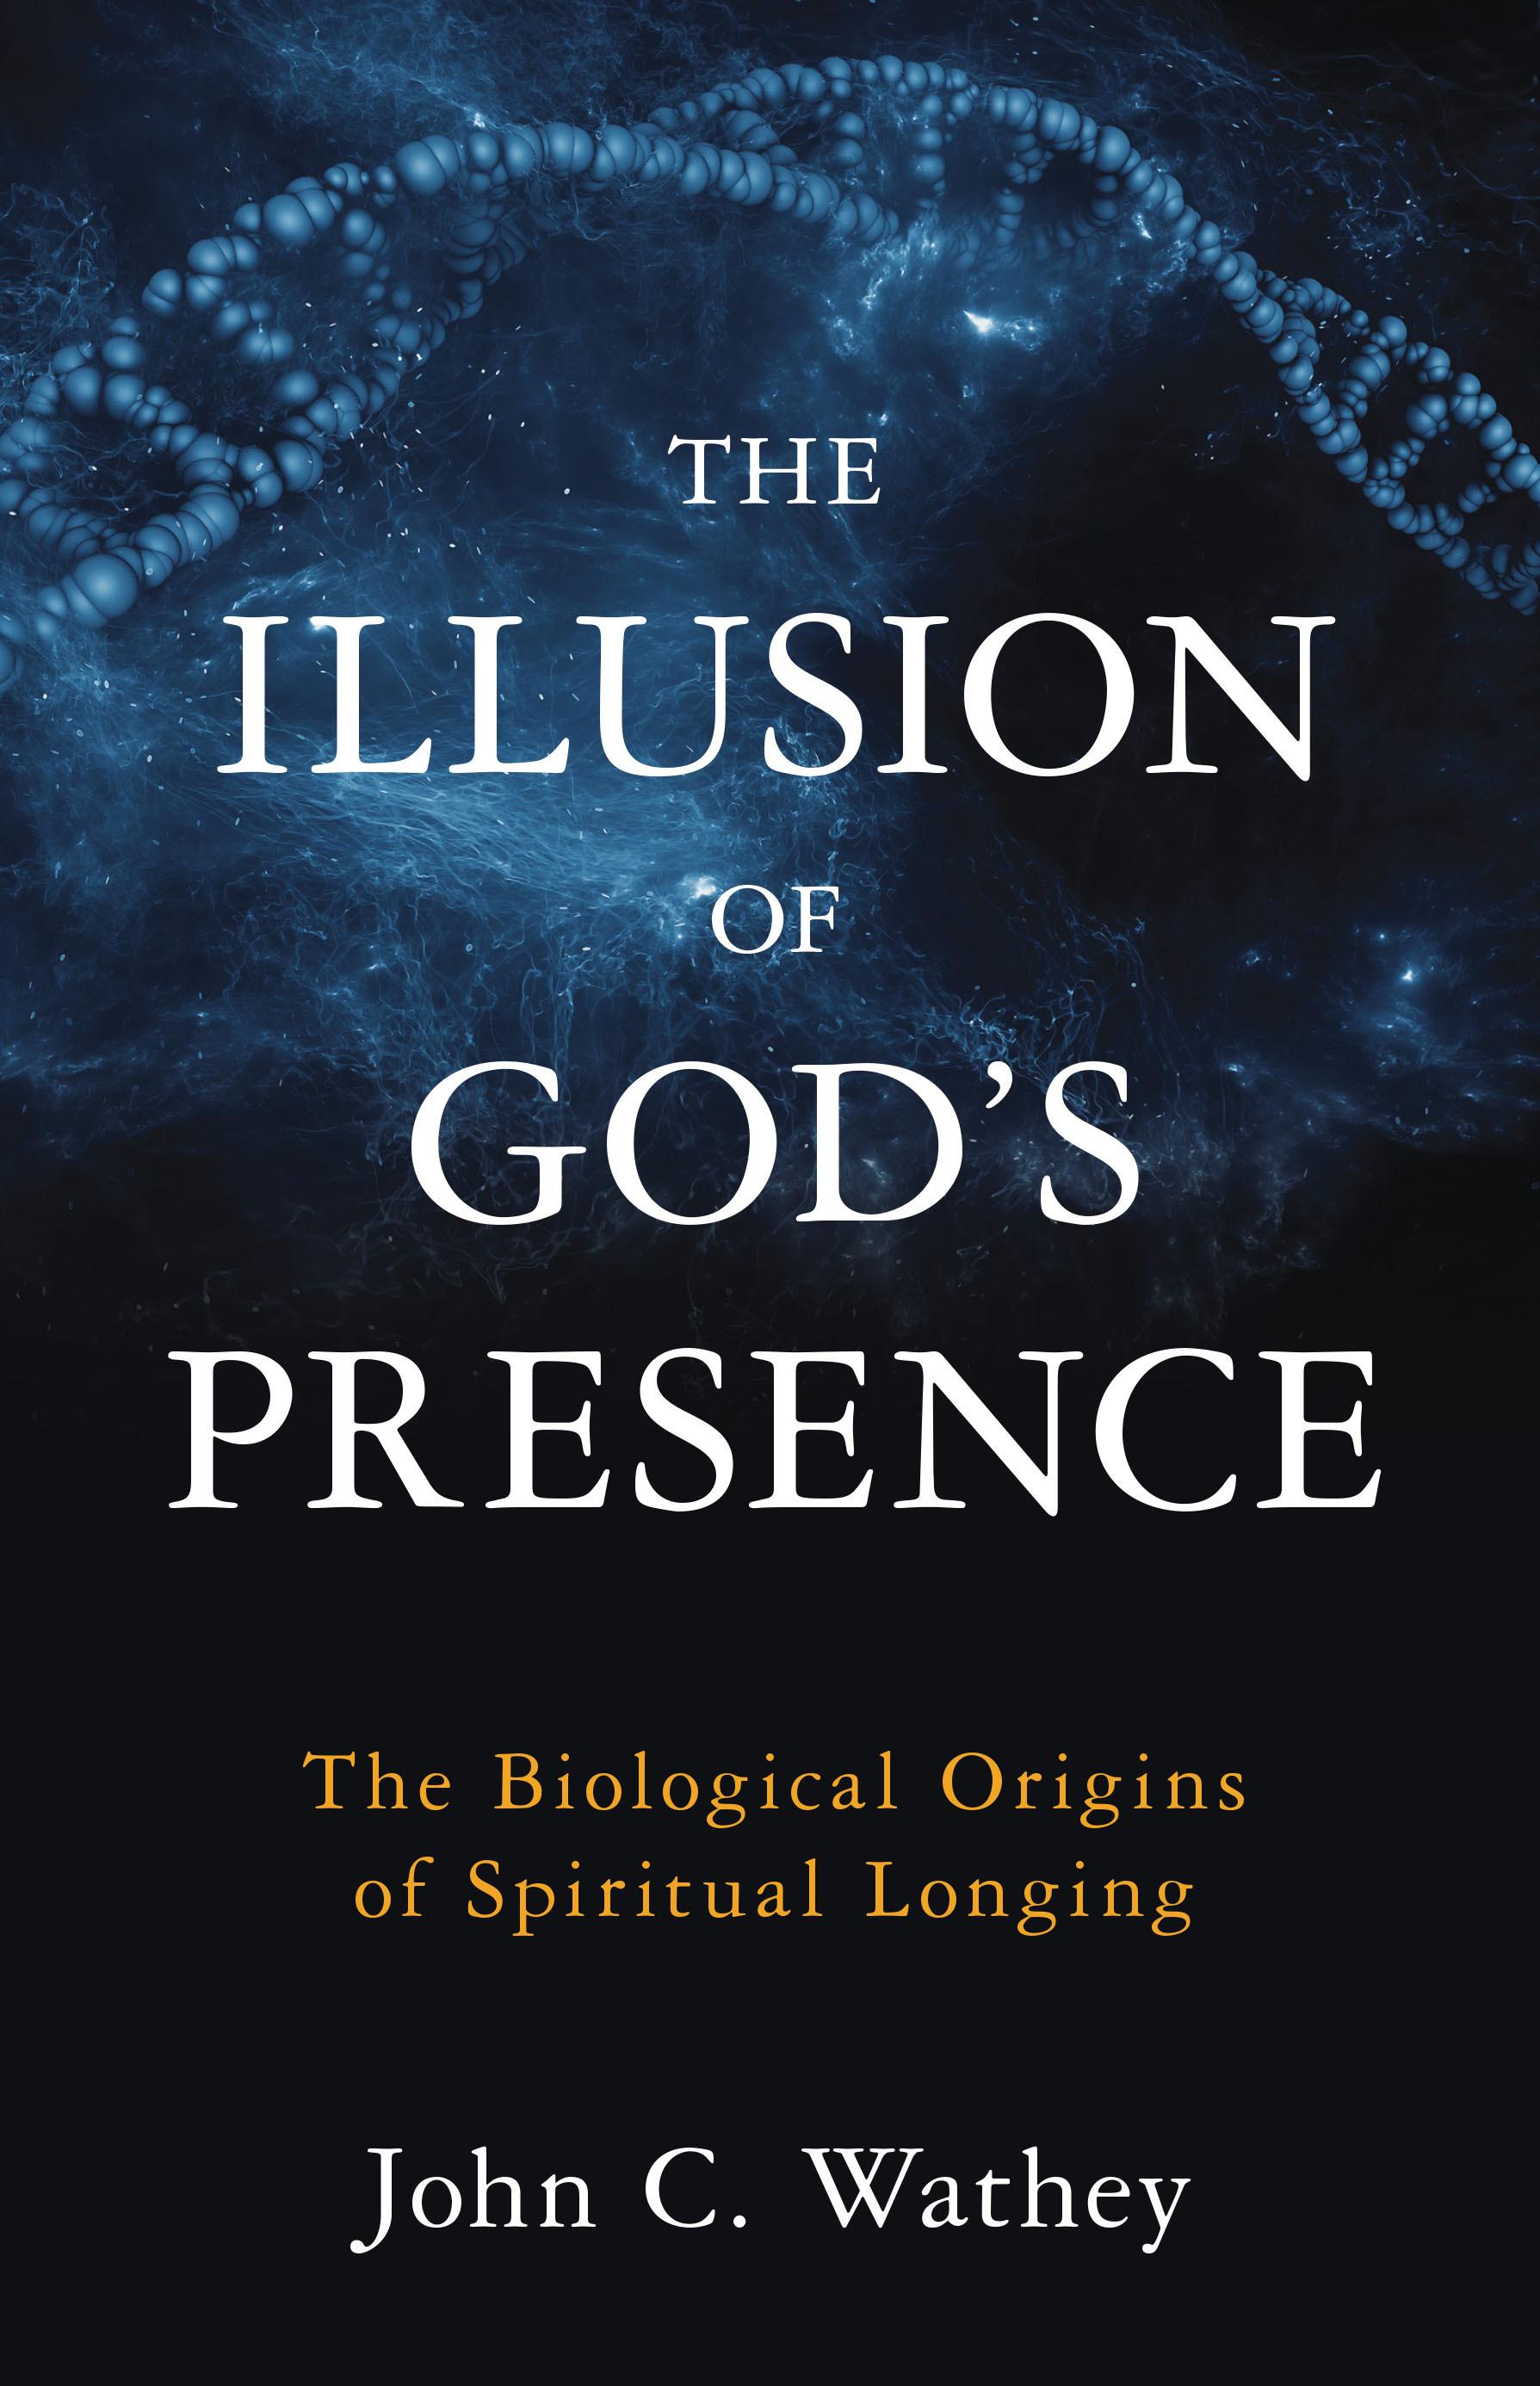 The Illusion of Gods Presence: The Biological Origins of Spiritual Longing John C. Wathey